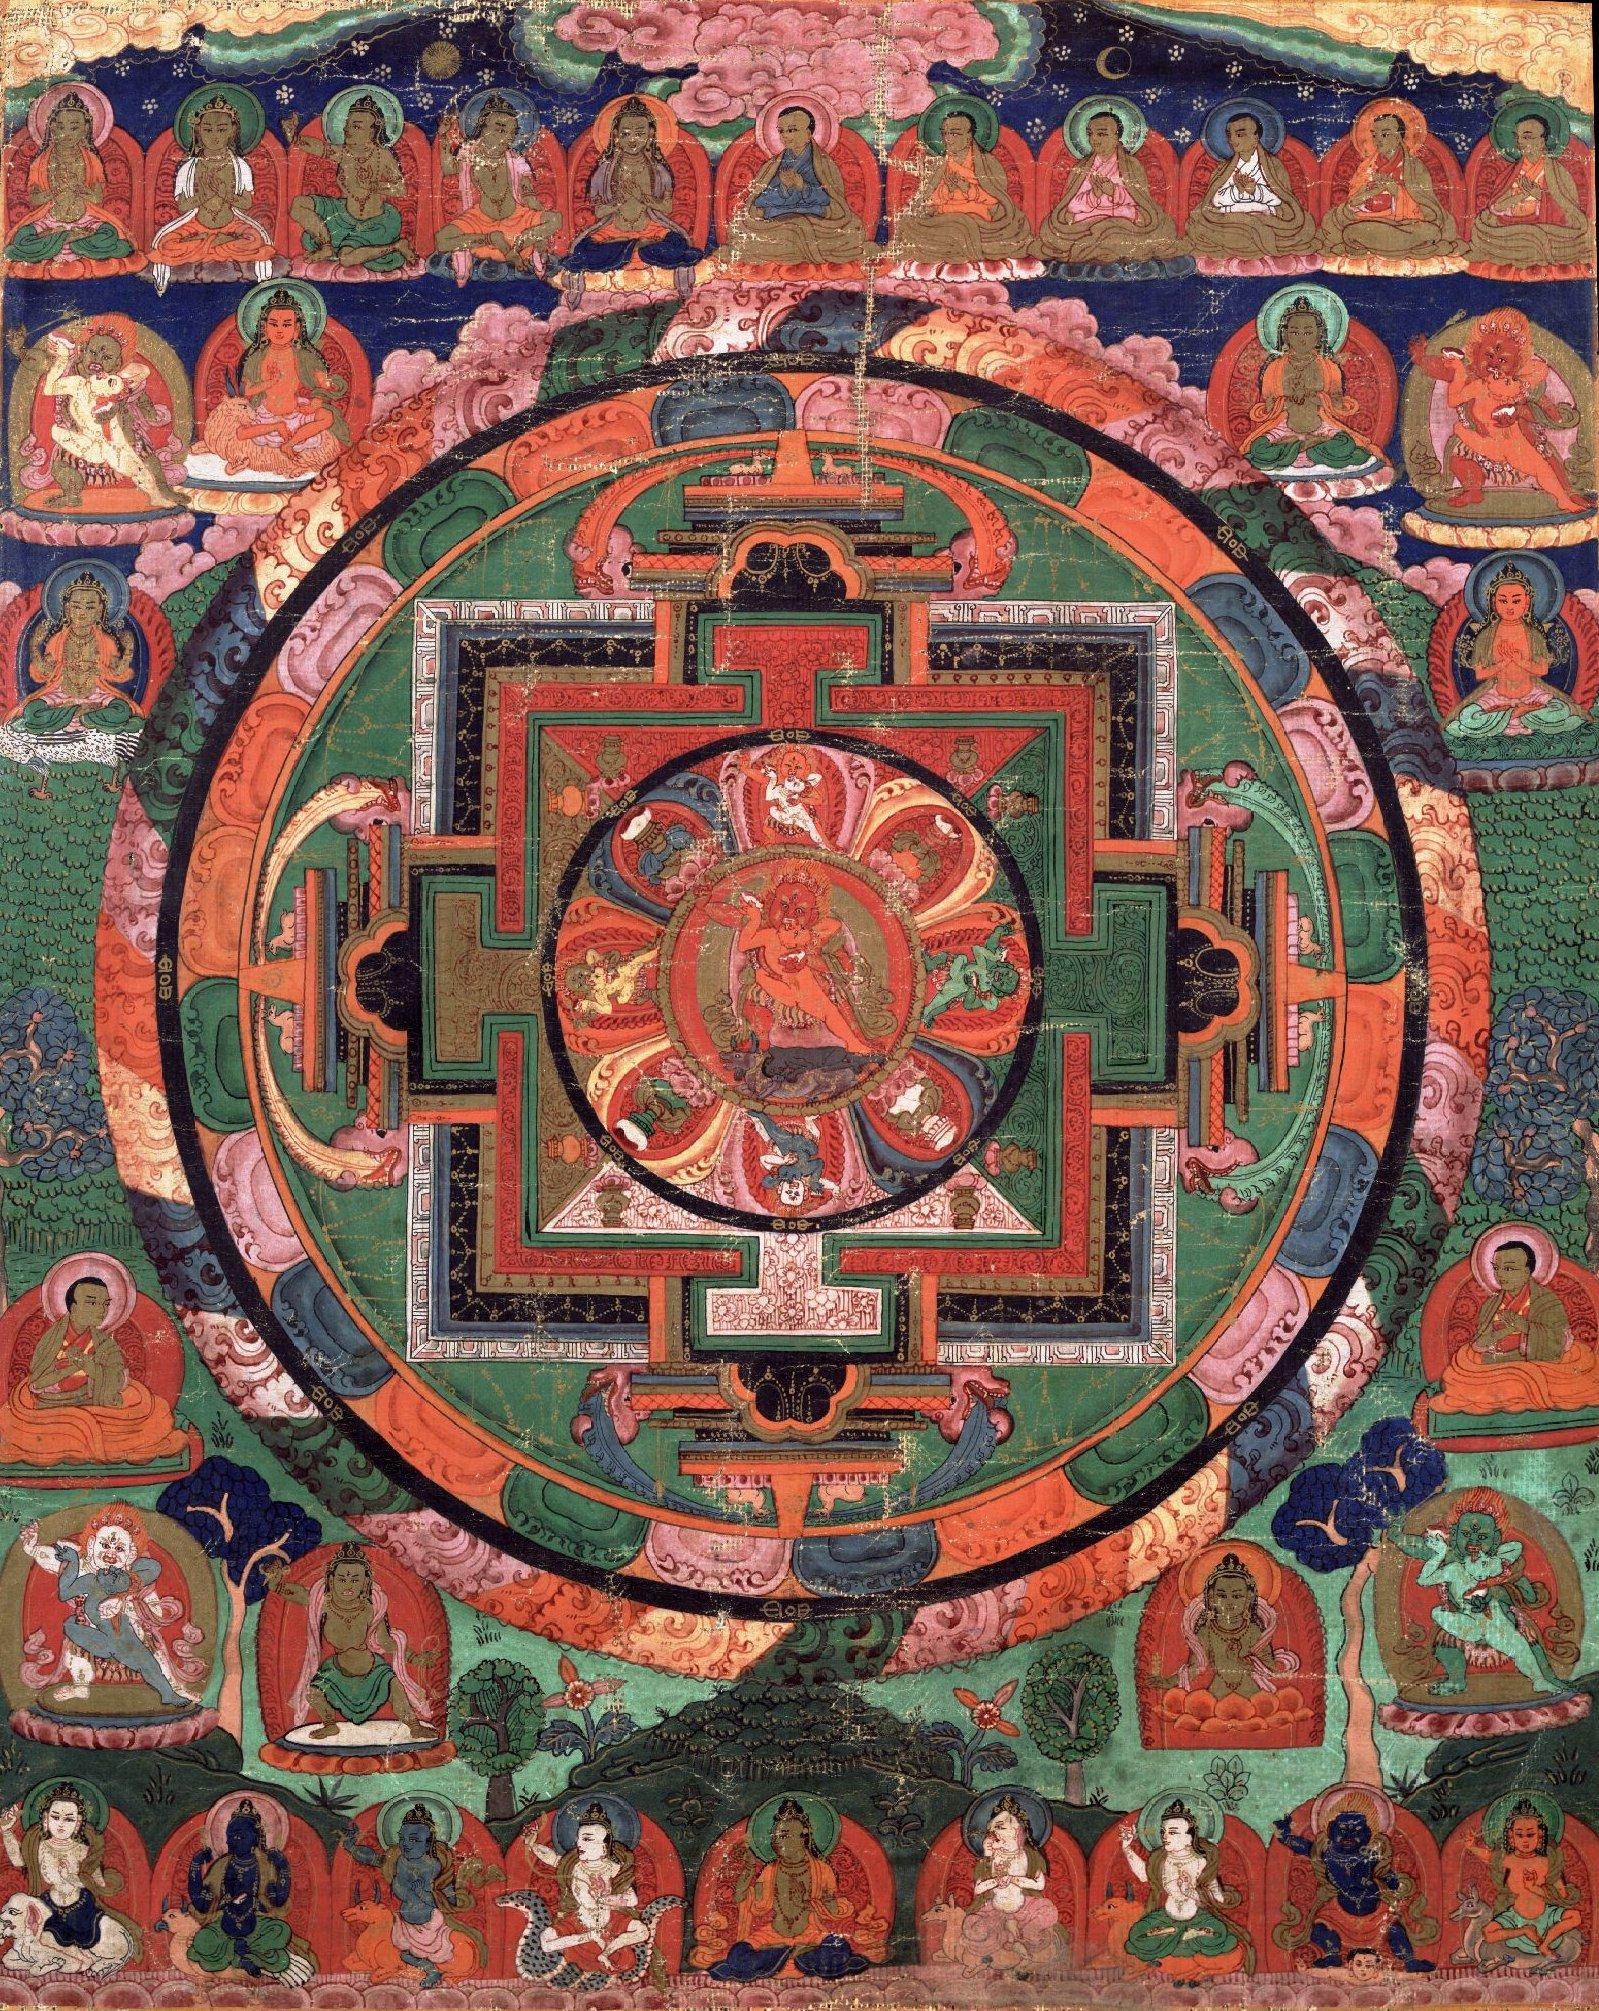 Painted 17th century Tibetan 'Five Deity Mandala', in the center is Rakta Yamari (the Red Enemy of Death) embracing his consort Vajra Vetali, in the corners are the Red, Green White and Yellow Yamari.jpg